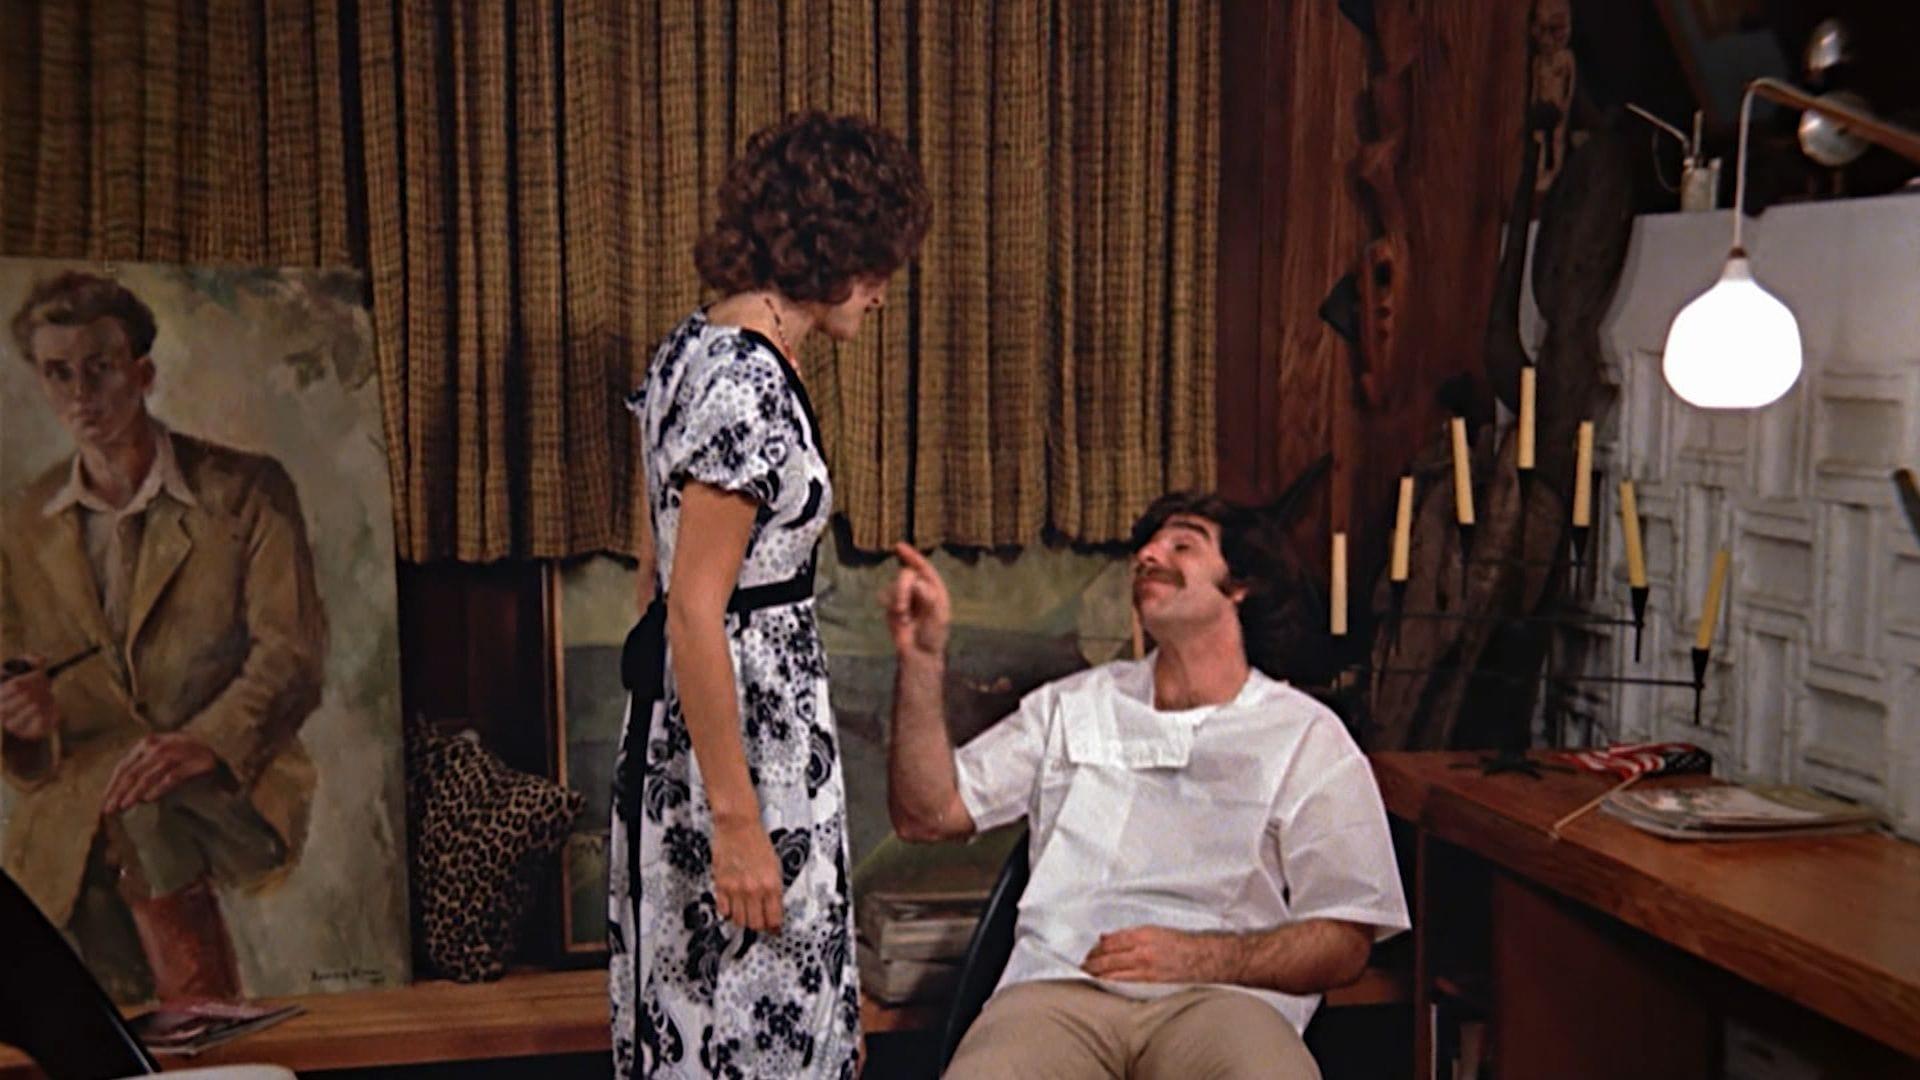 Watch deep throat the movie 1972 online